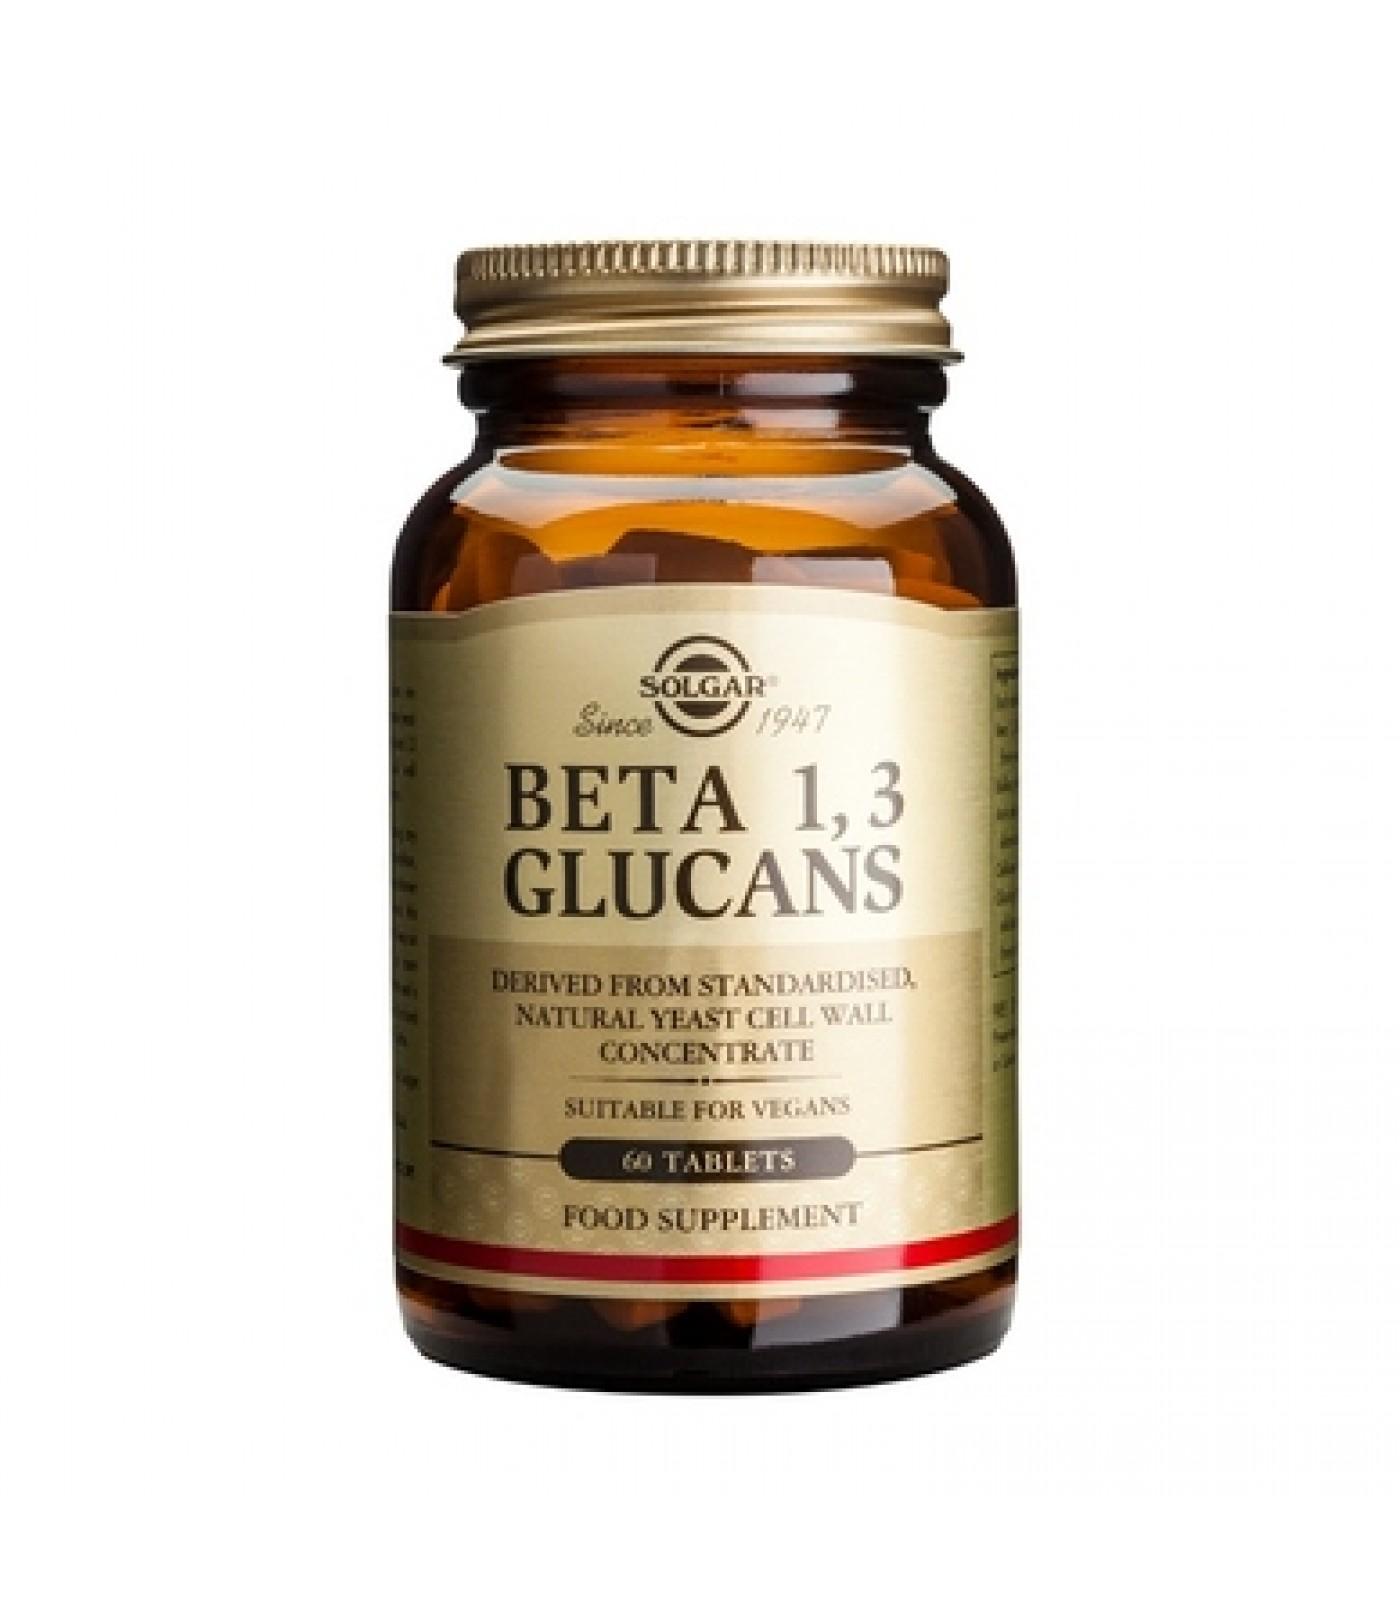 Solgar - Beta 1,3 Glucans / 60 tabs.